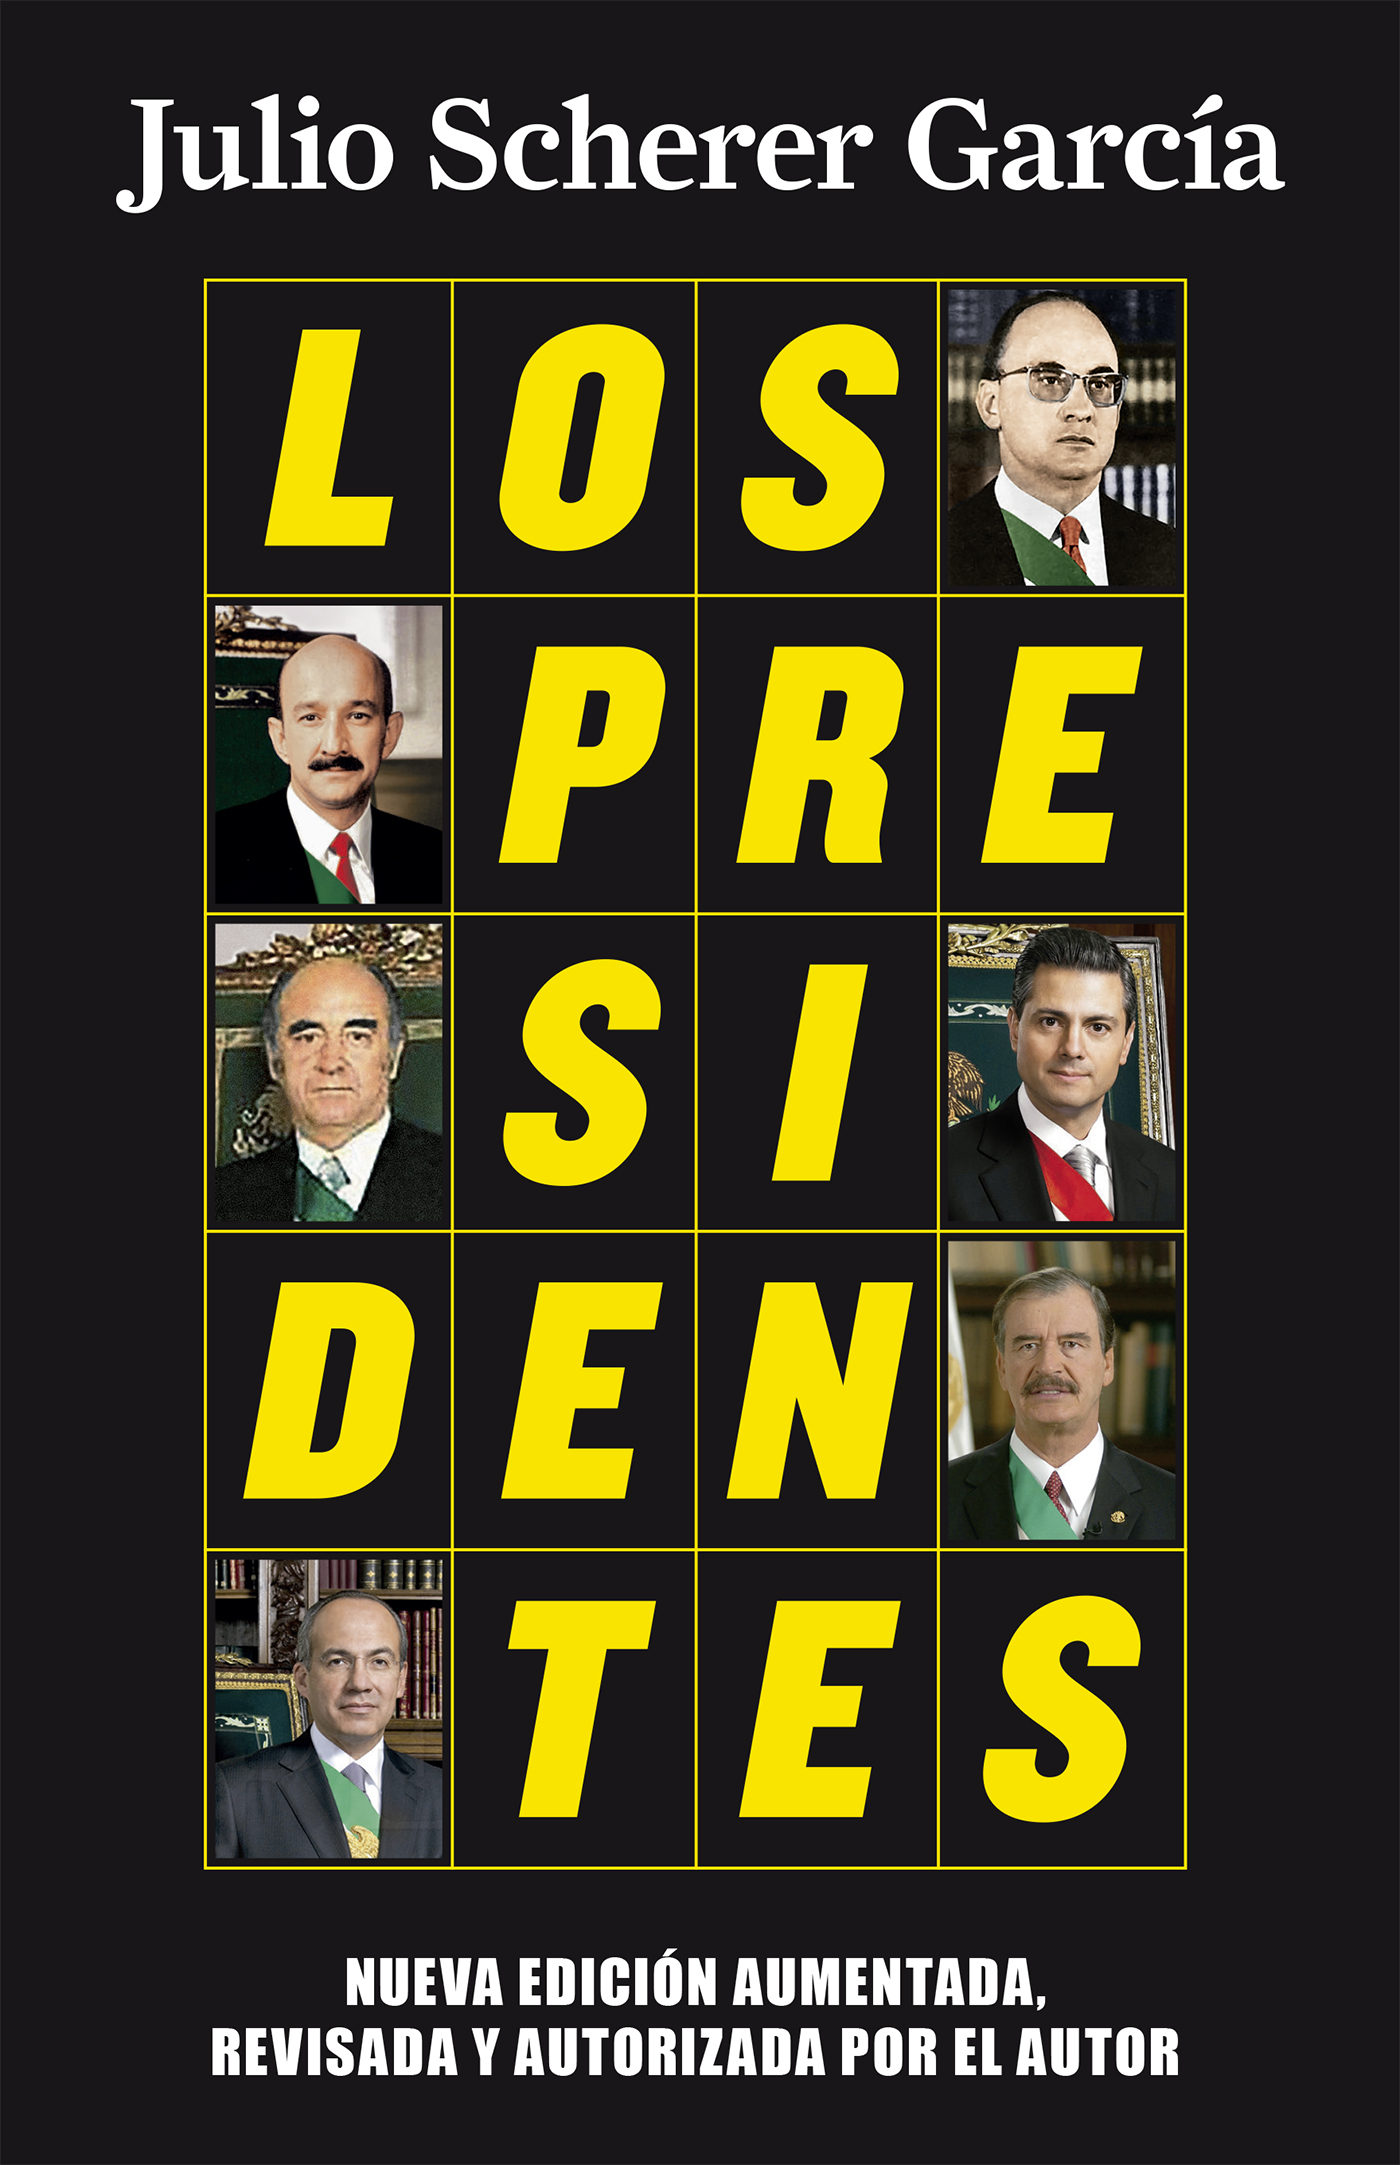 los presidentes julio scherer pdf gratis